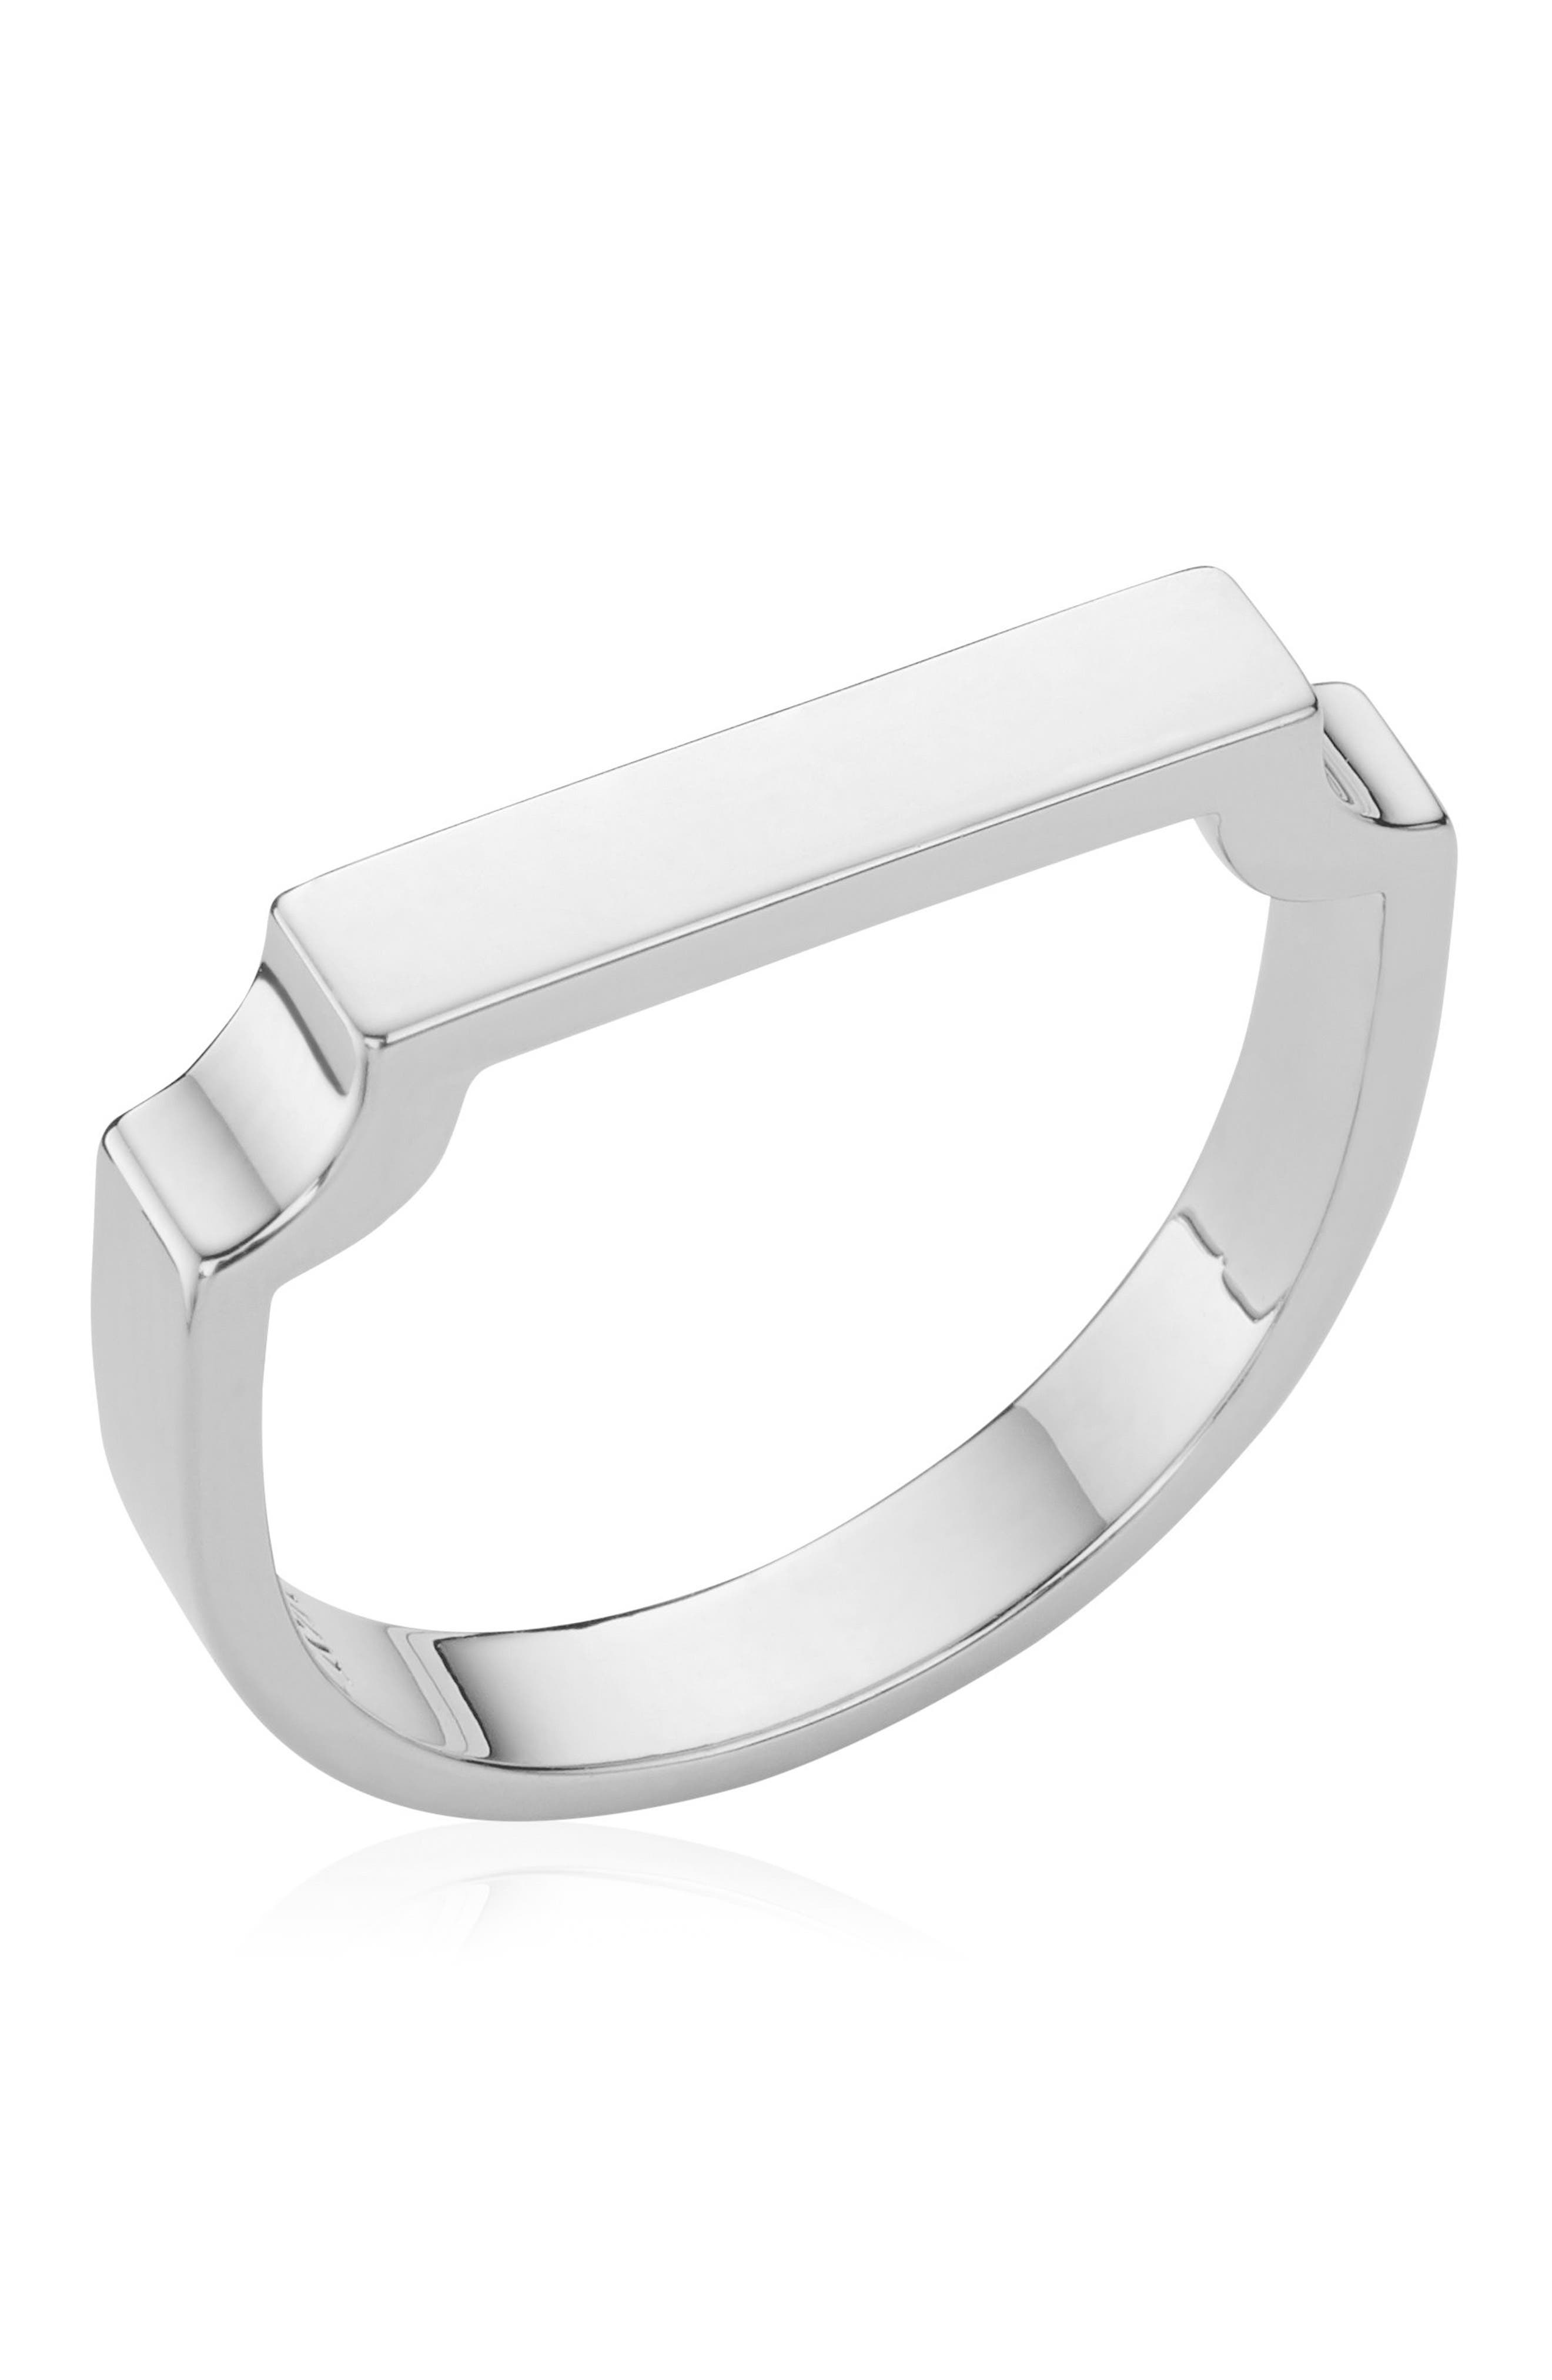 Signature Ring,                             Alternate thumbnail 4, color,                             SILVER